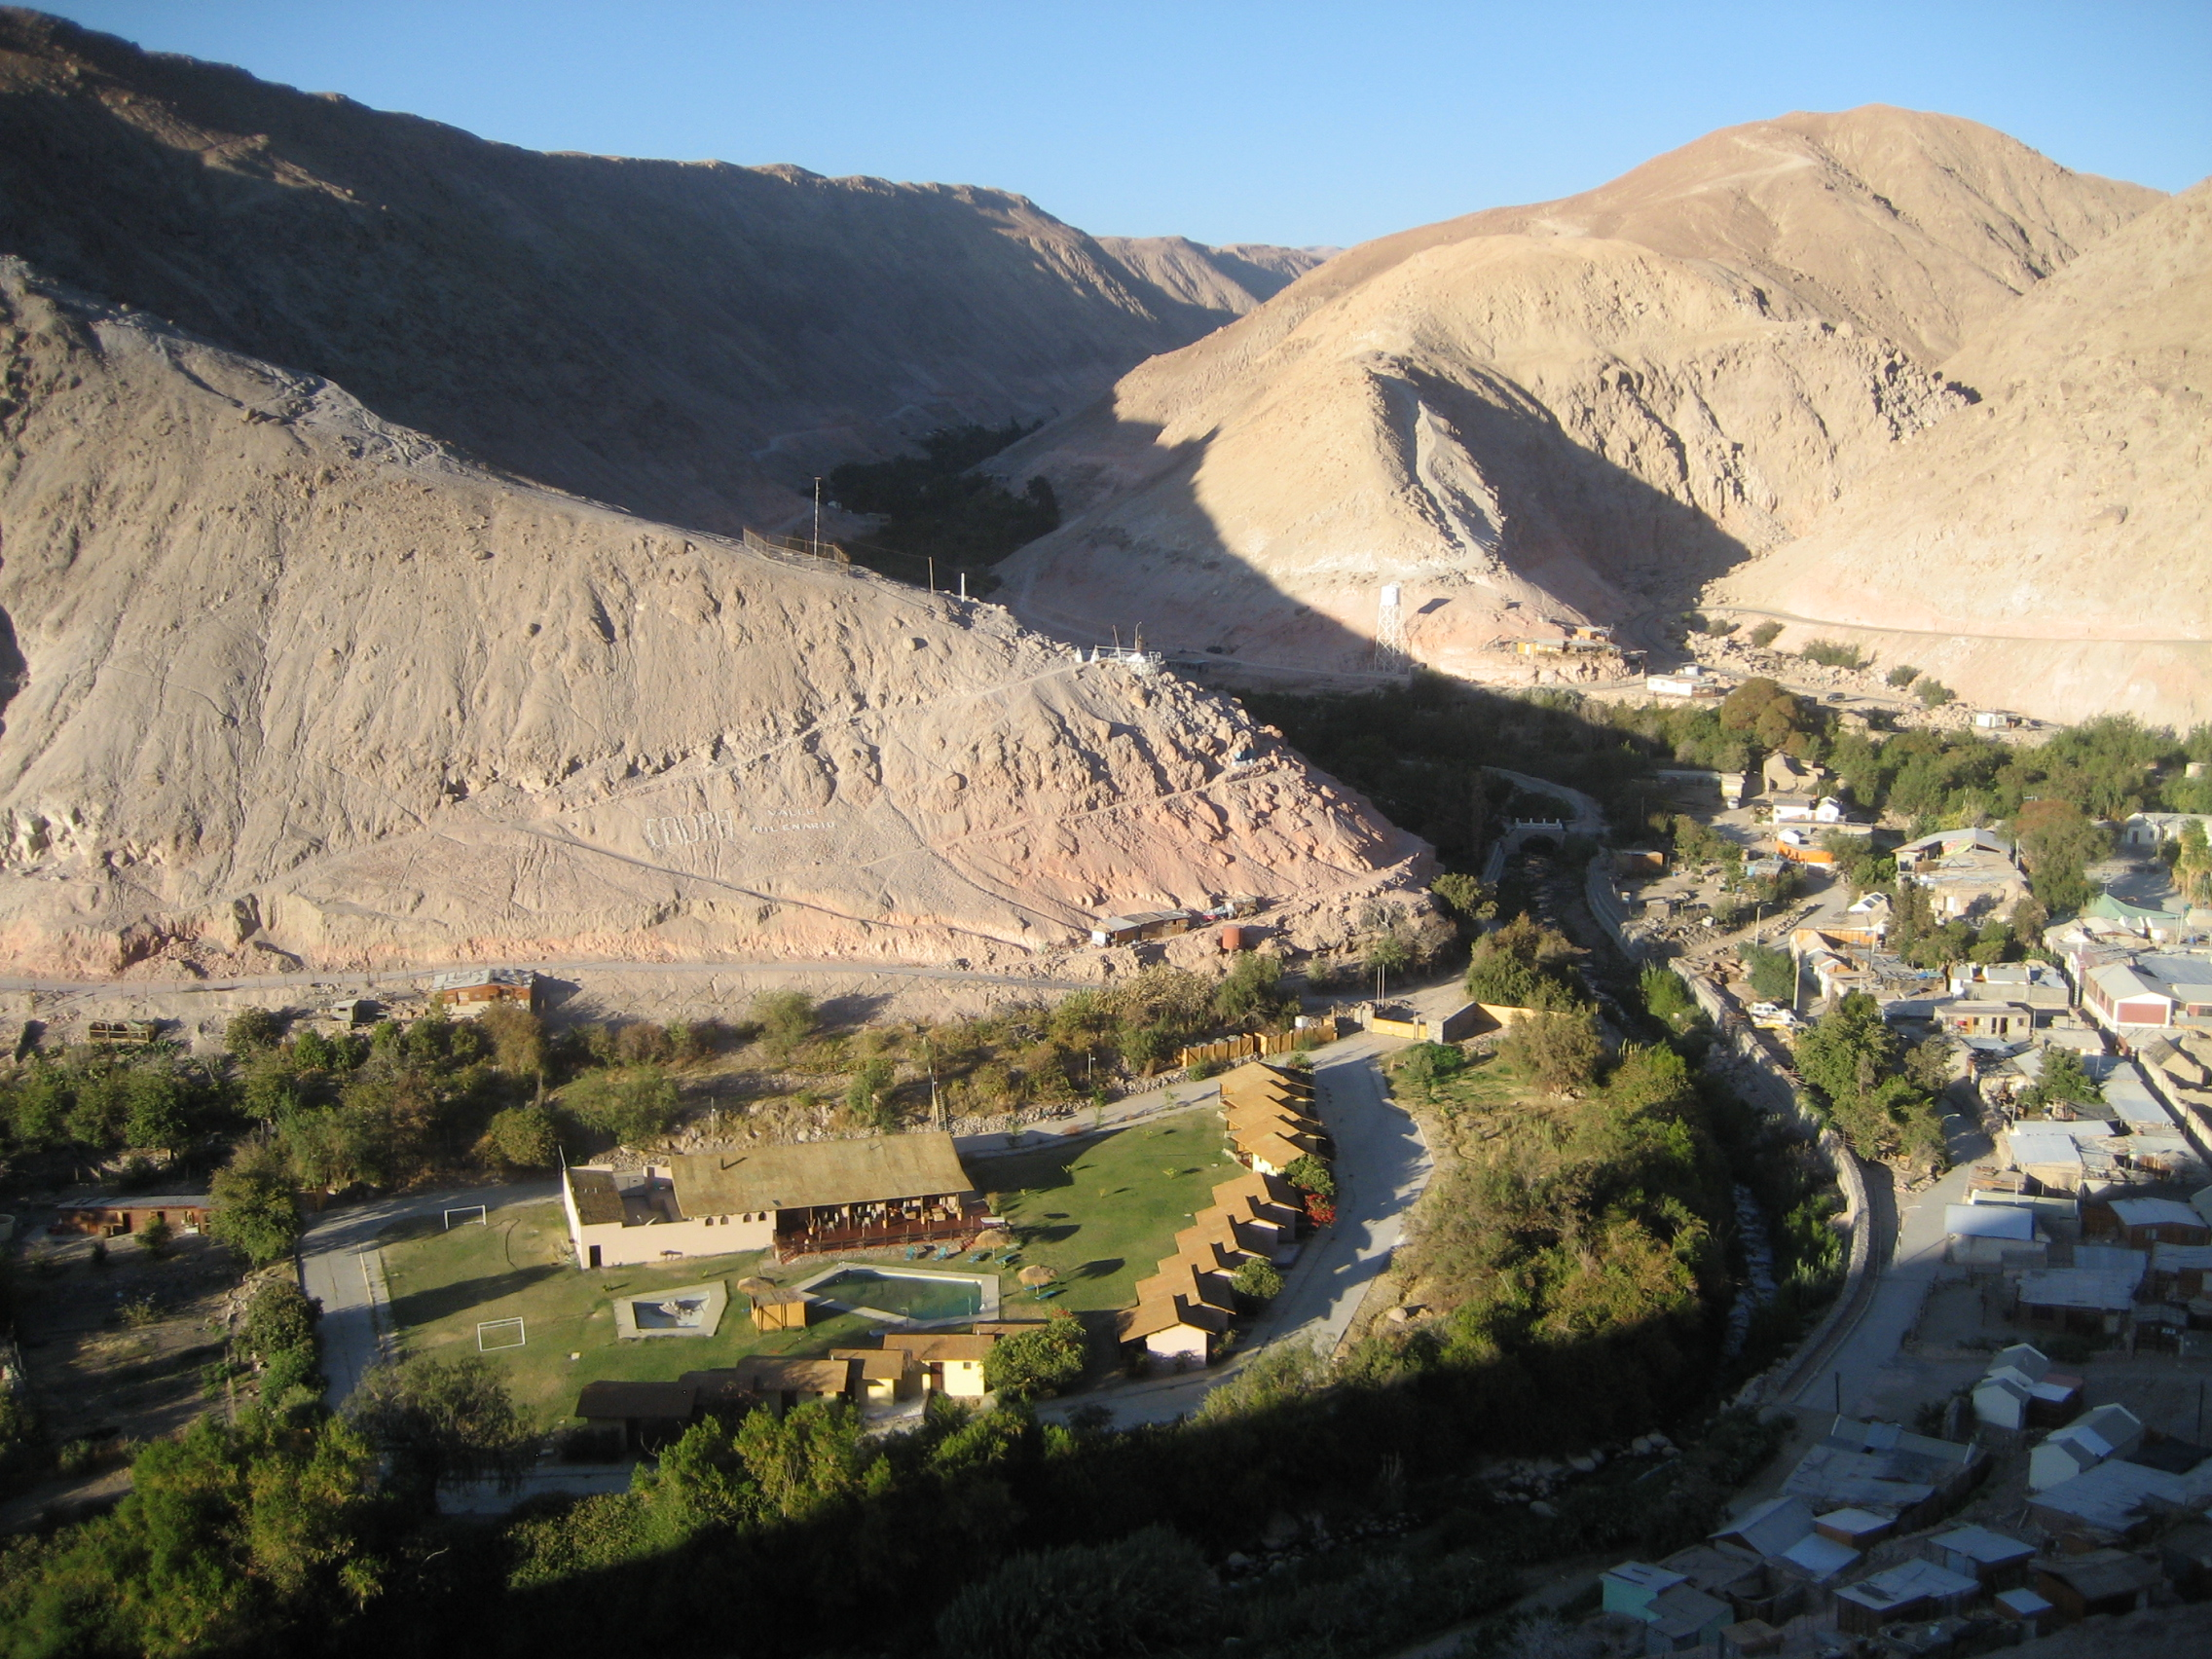 La Ruta Altiplánica